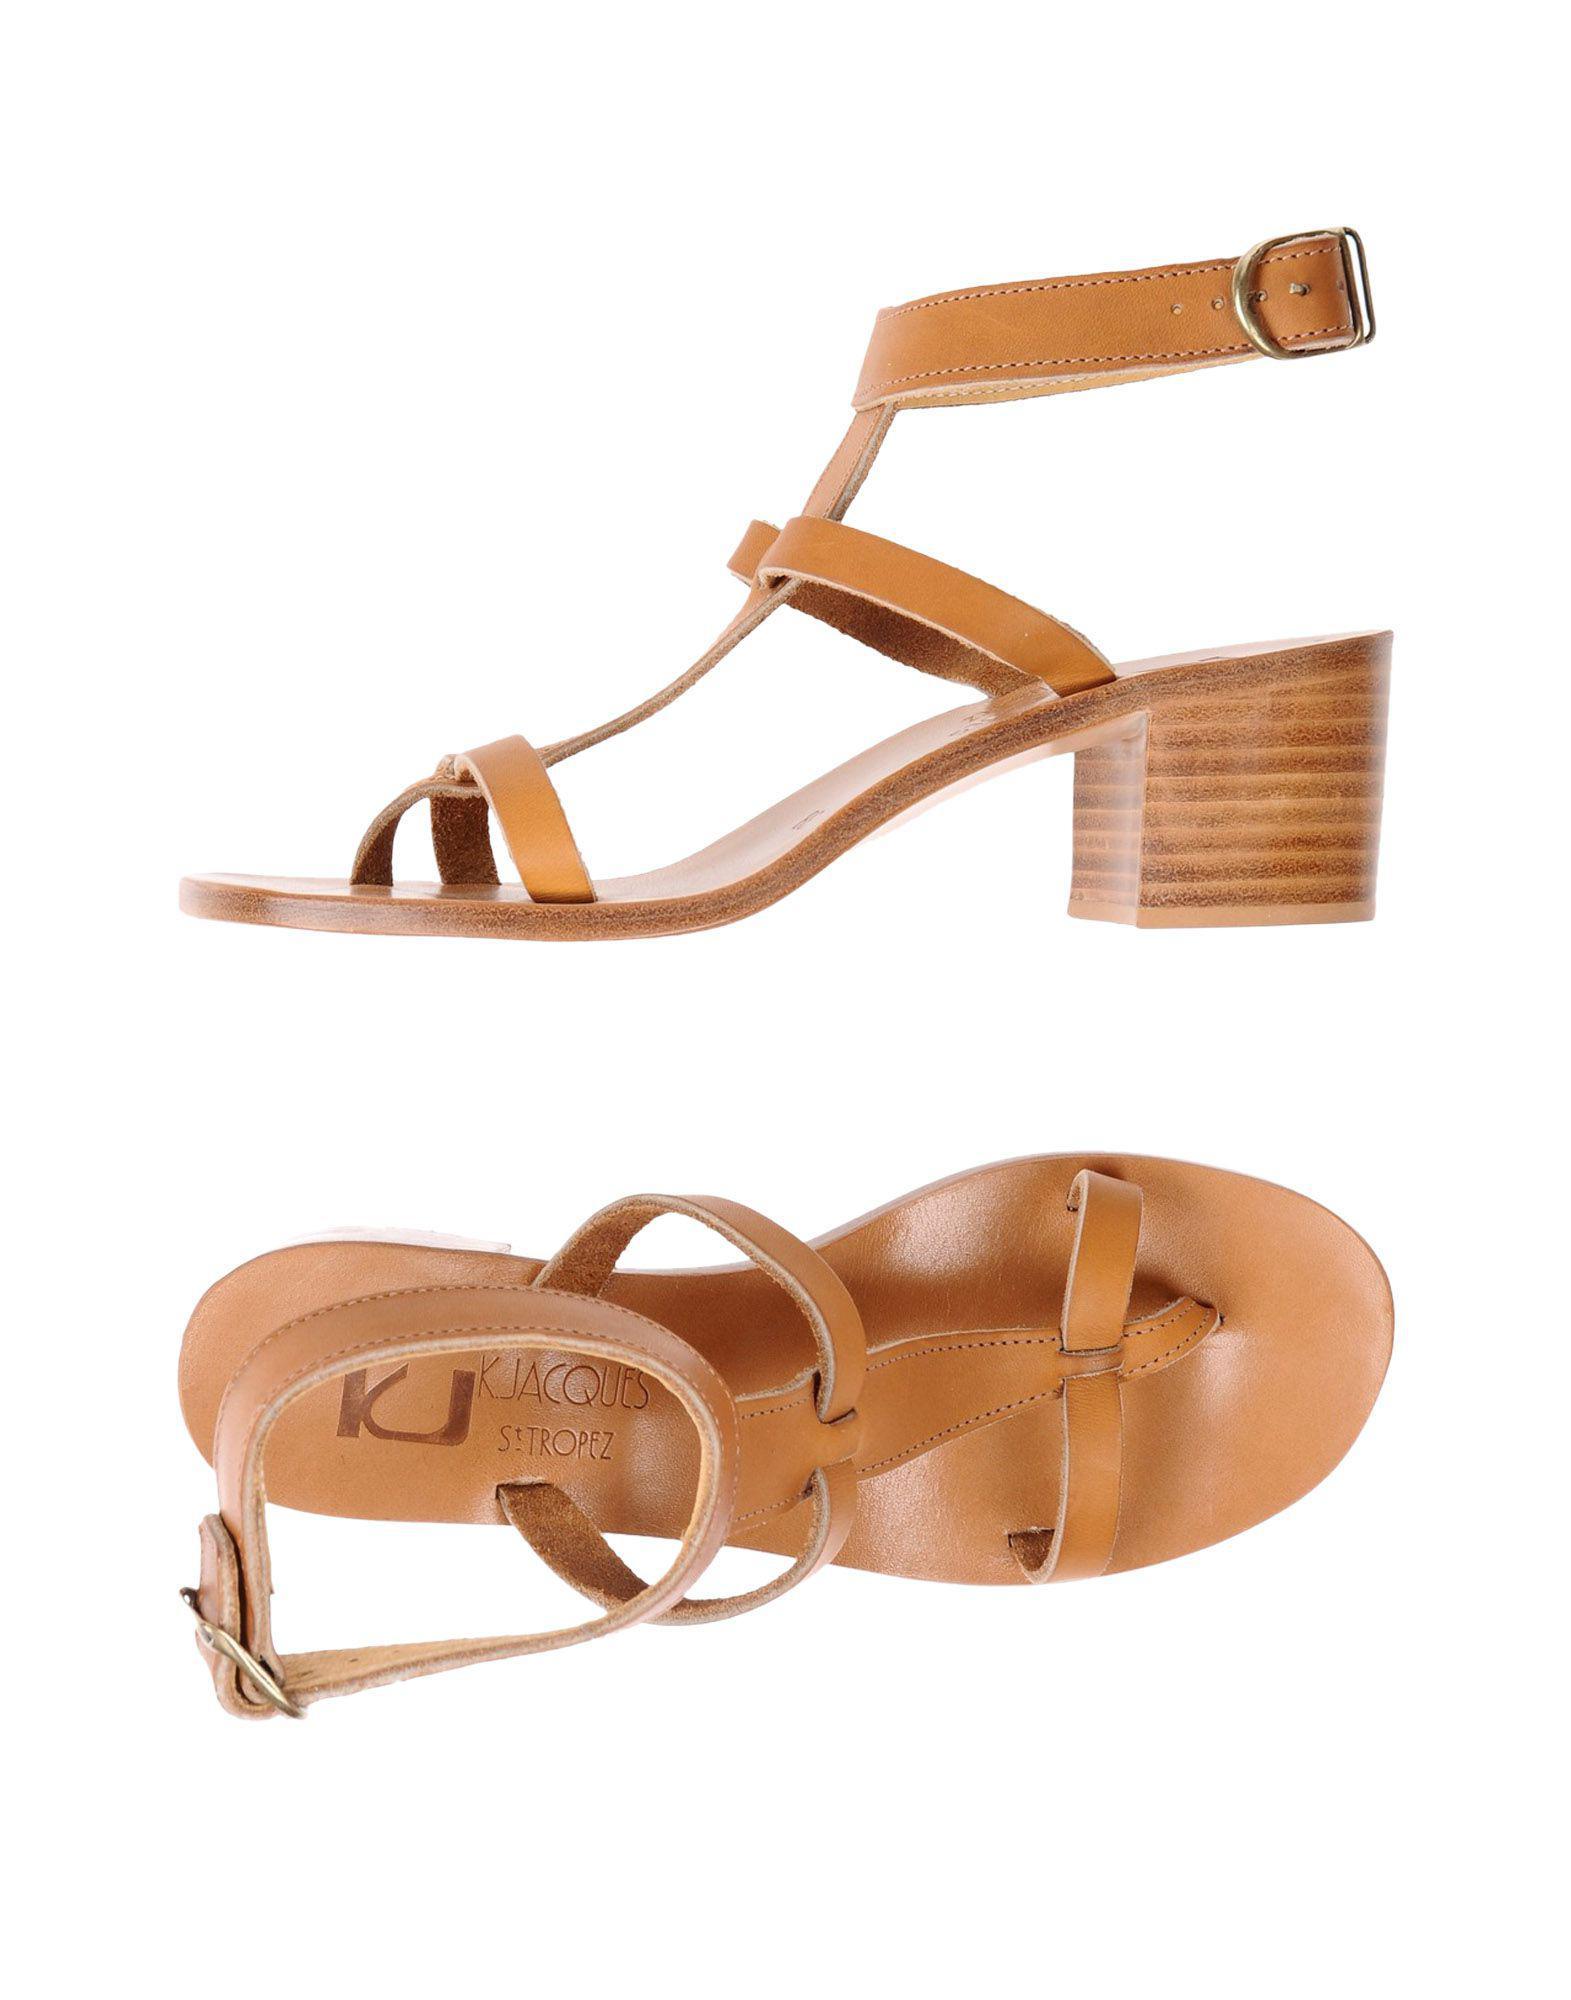 FOOTWEAR - Toe post sandals K.Jacques LOcFCNV